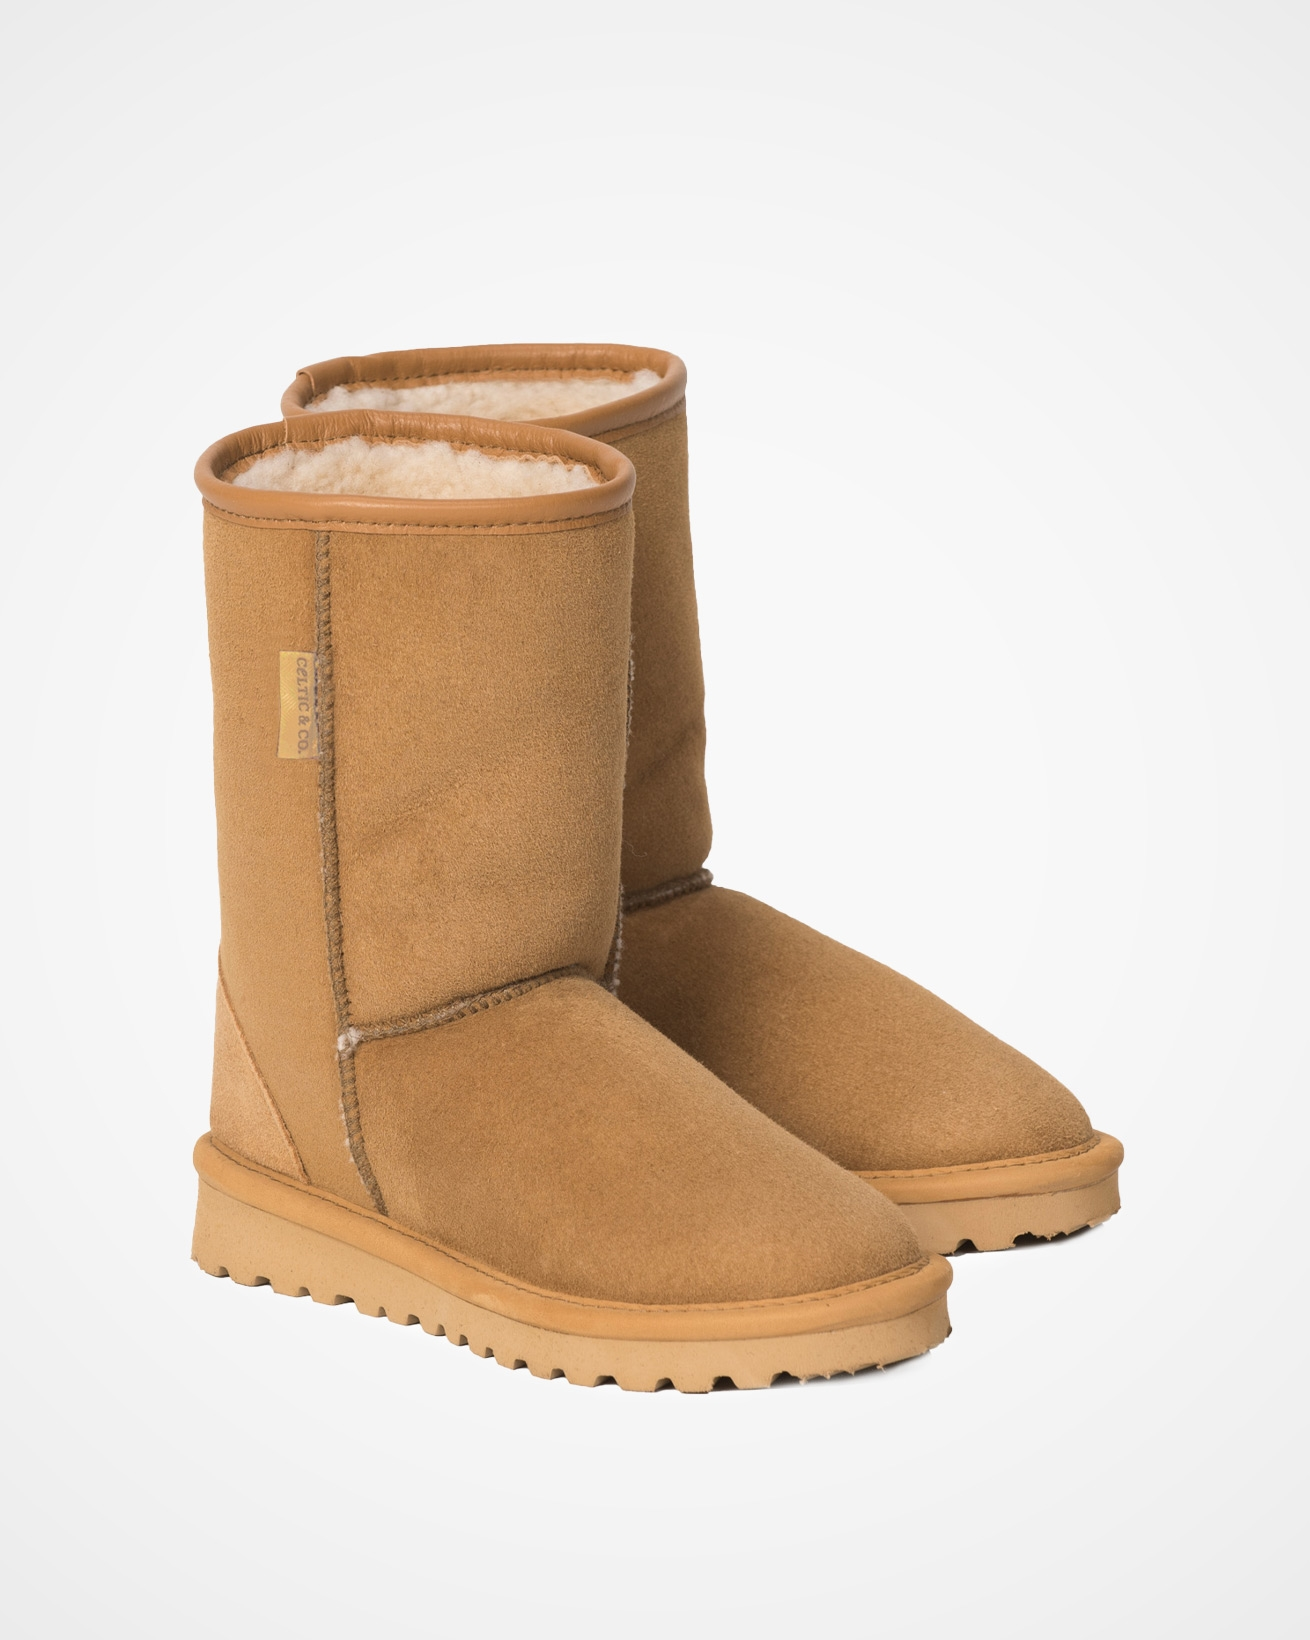 5894_classic-sheepskin-boots-regular_spice_pair.jpg